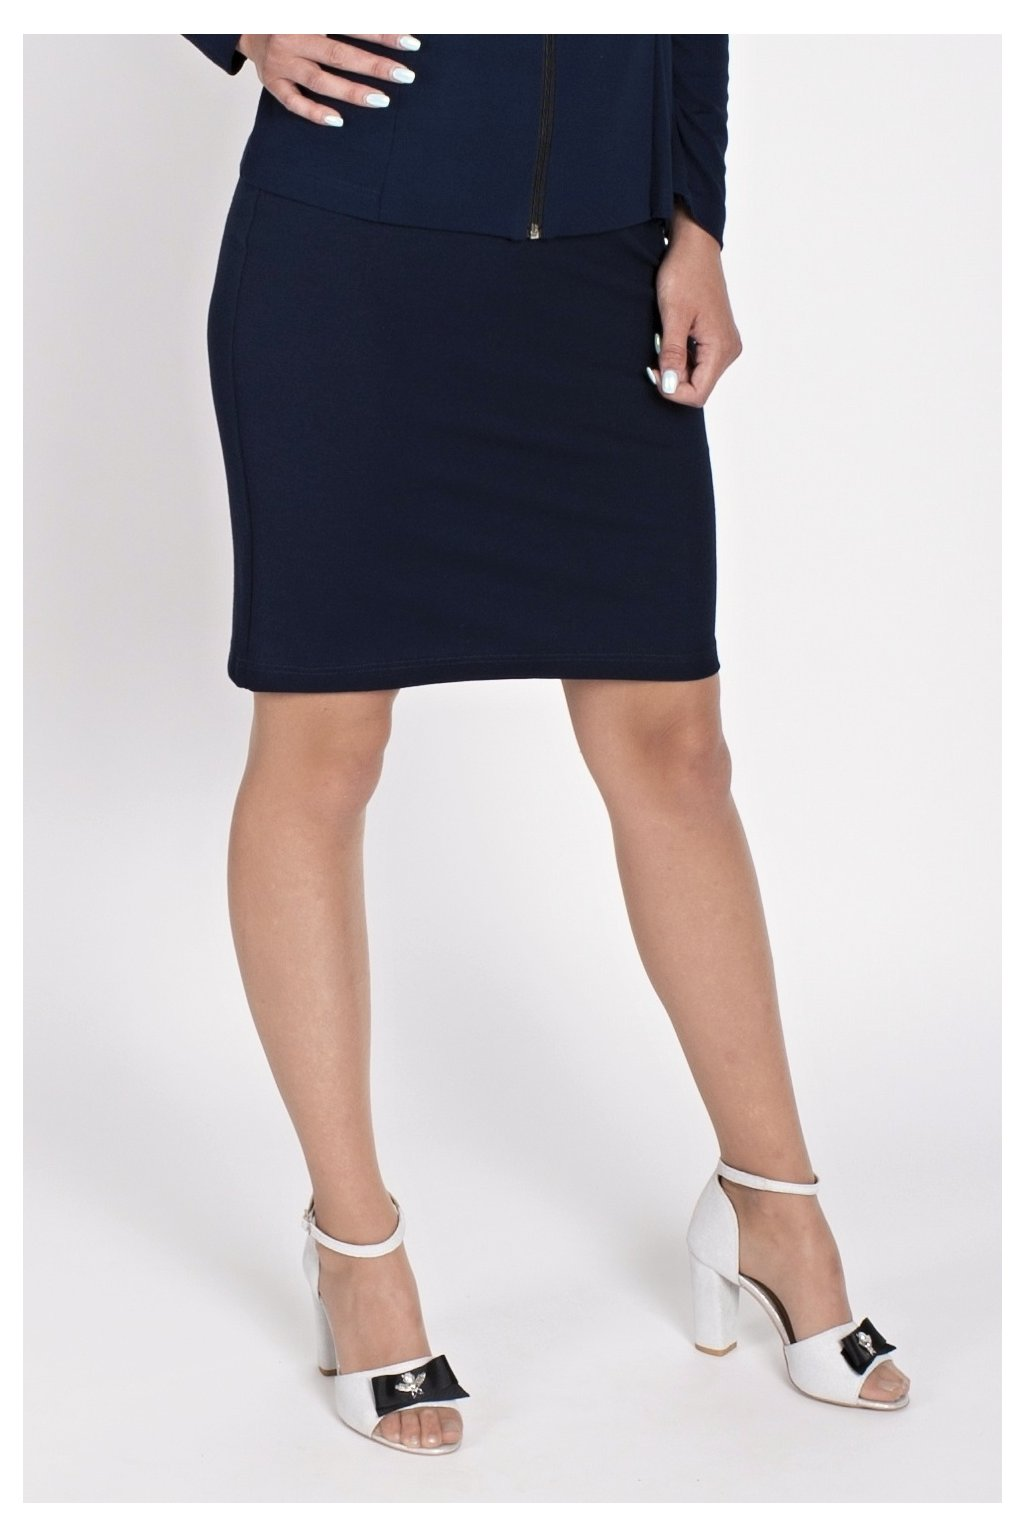 modrá-dámska-sukňa-favab.sk-jpg